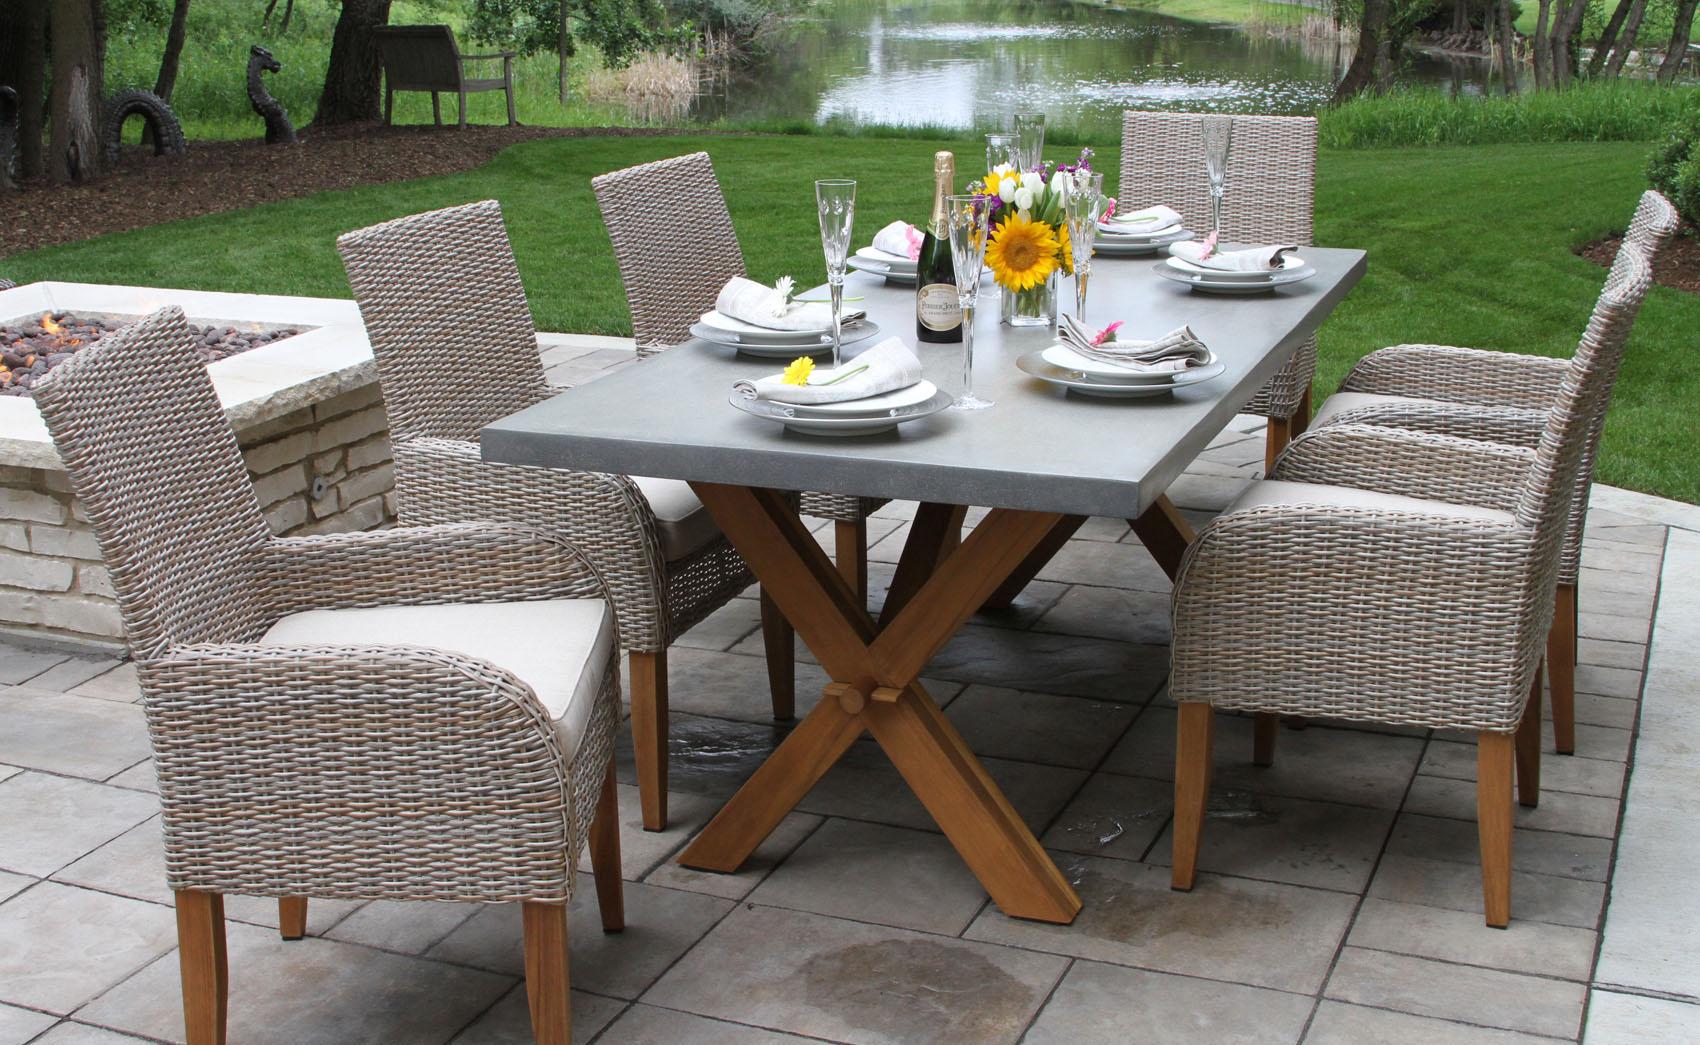 Teak Outdoor Furniture Sets Top Recommendations - Wooden Furniture Hub